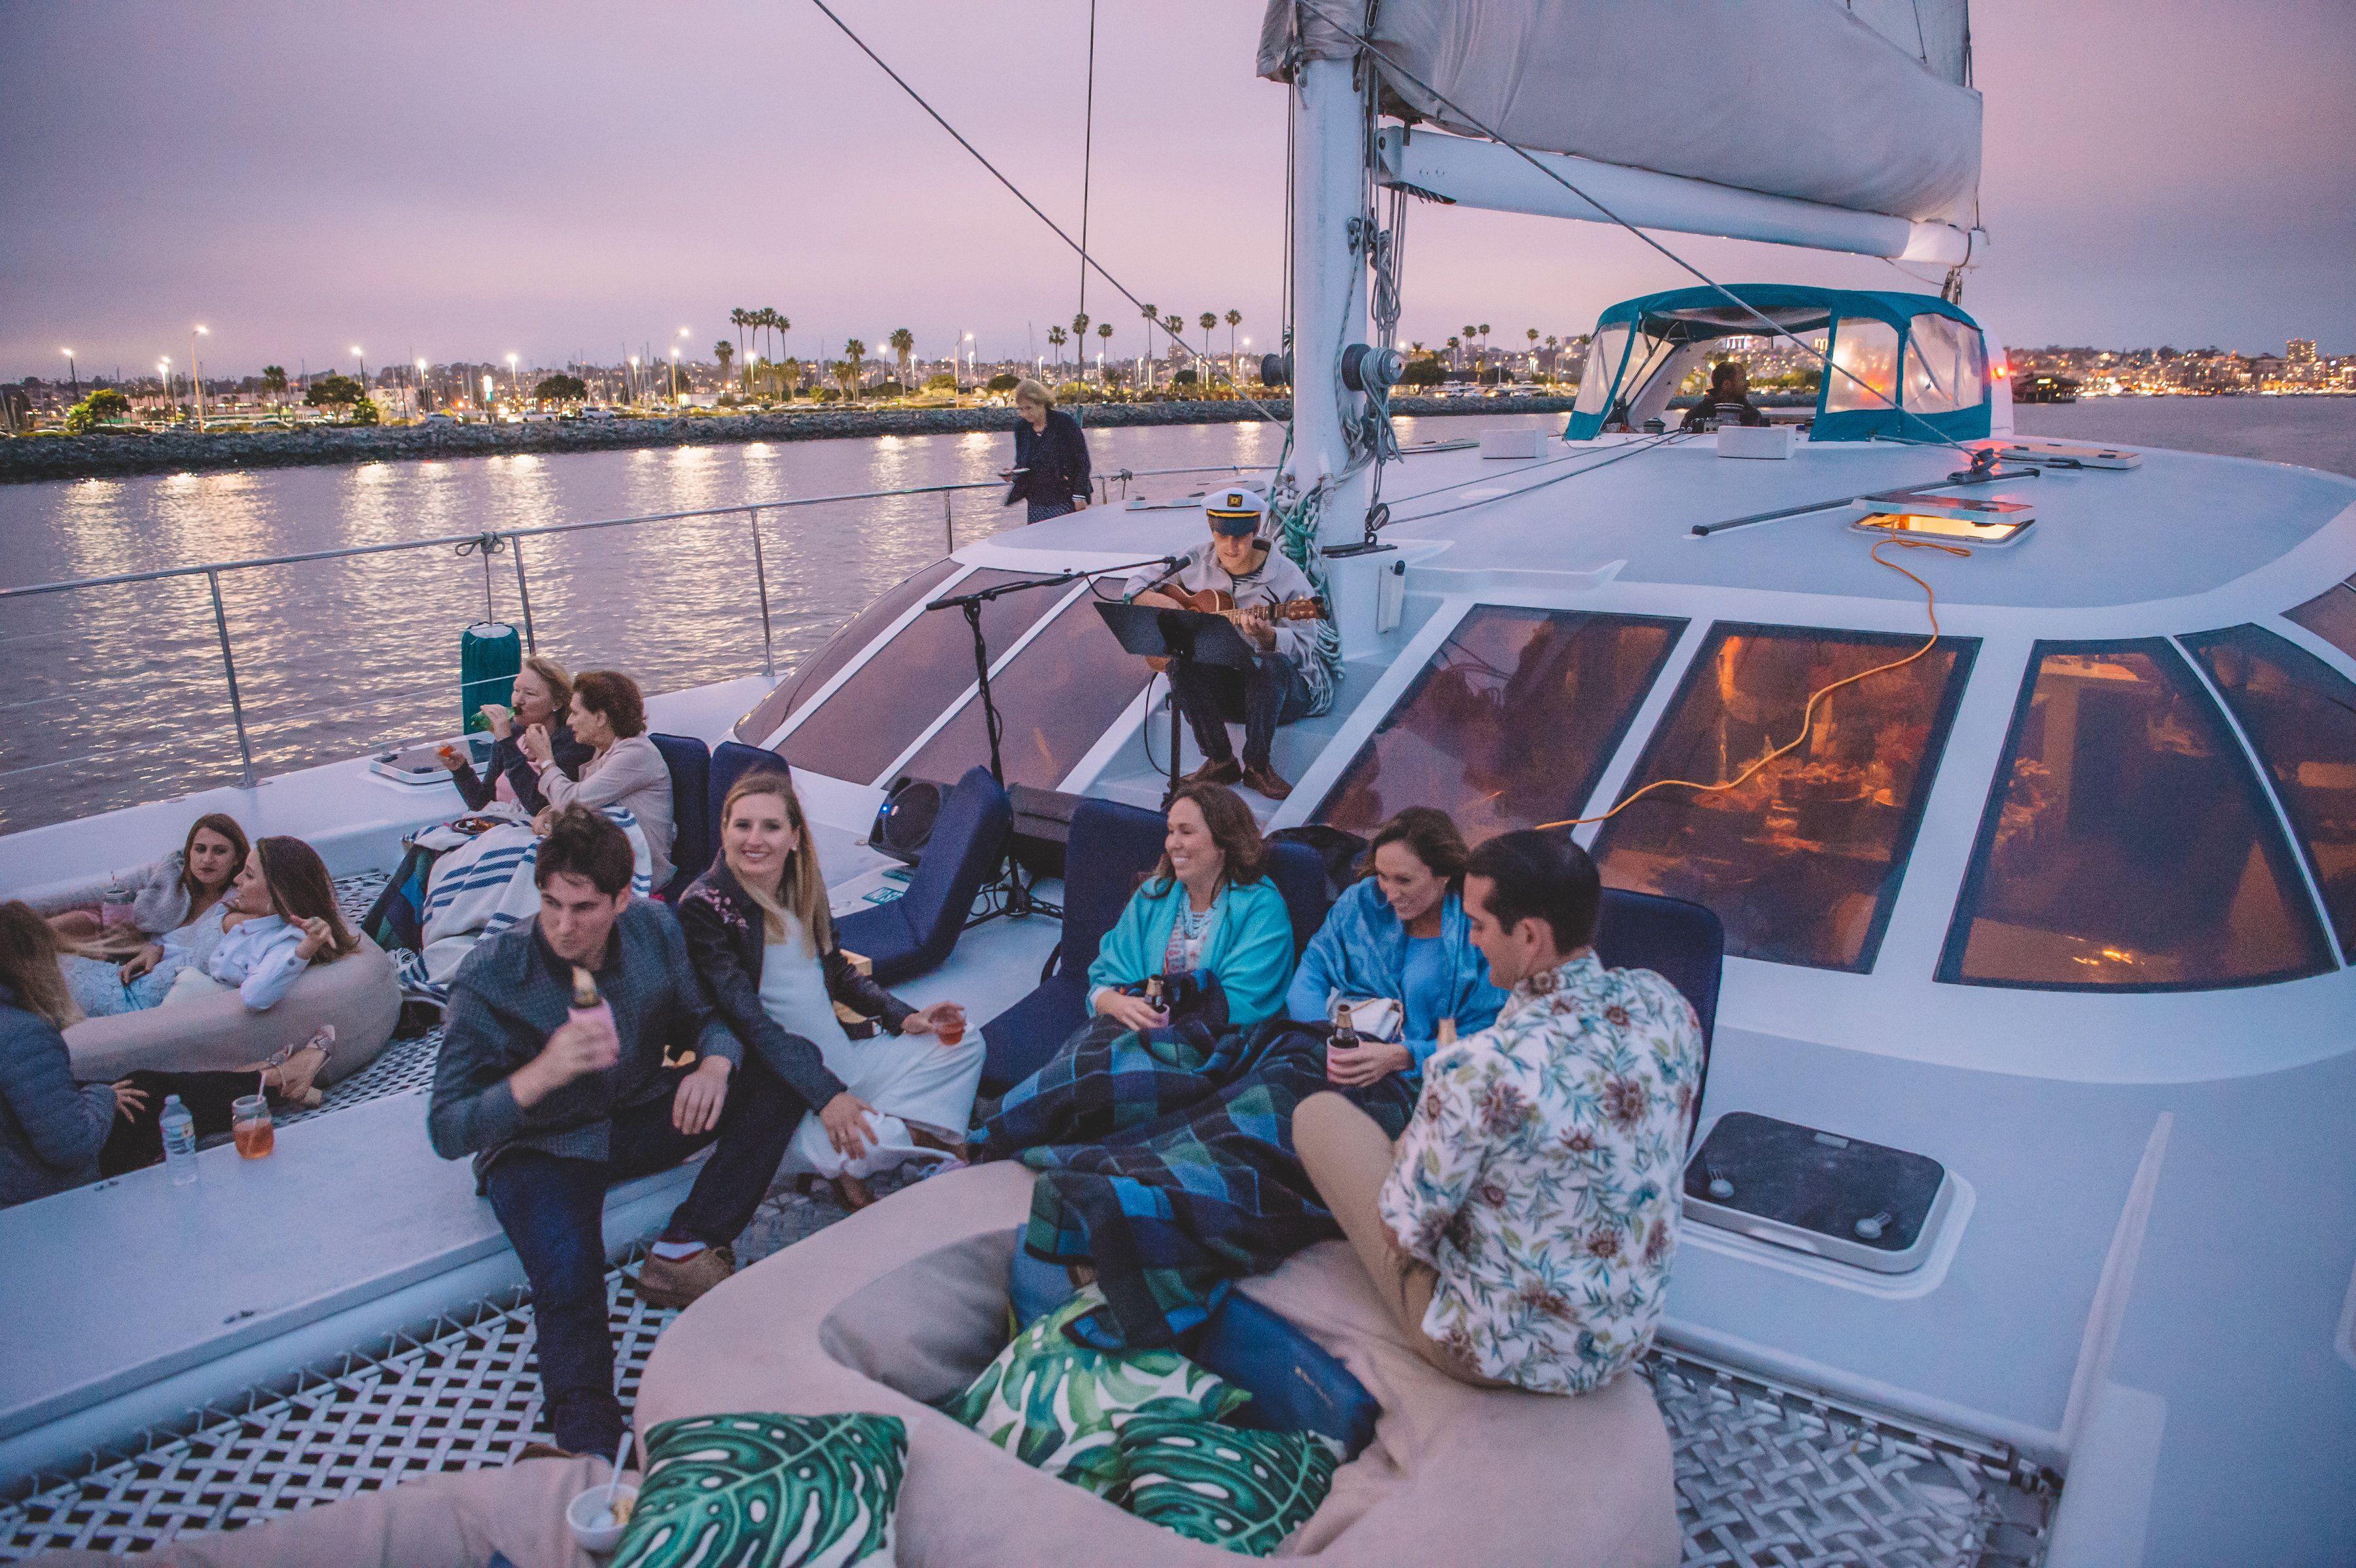 Aolani catamaran private event in san diego ca photo by